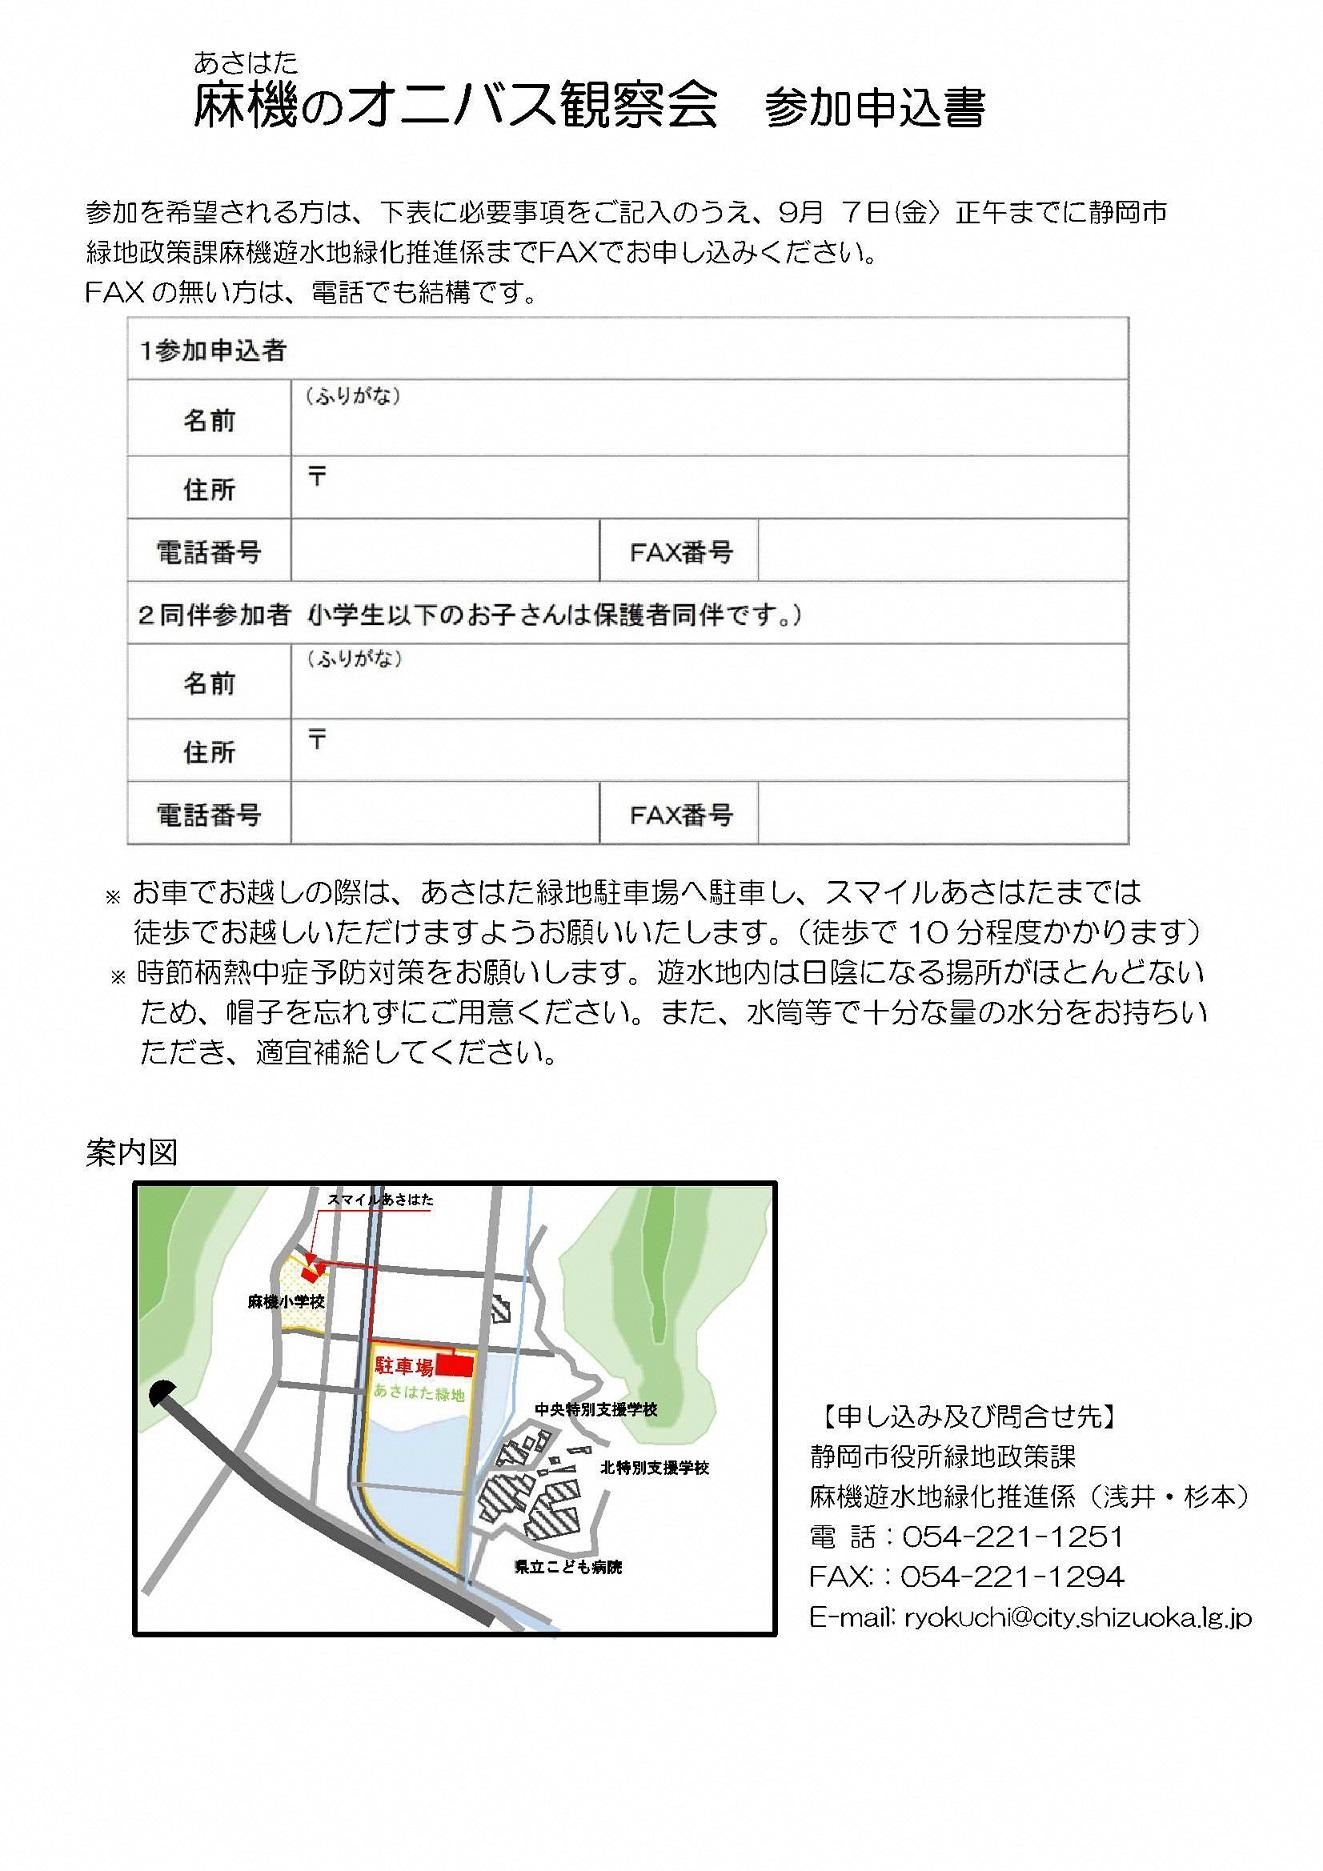 http://www.shizutan.jp/learning/2018/08/08/images/H30%E3%82%AA%E3%83%8B%E3%83%90%E3%82%B9%E3%83%81%E3%83%A9%E3%82%B7-2.jpg